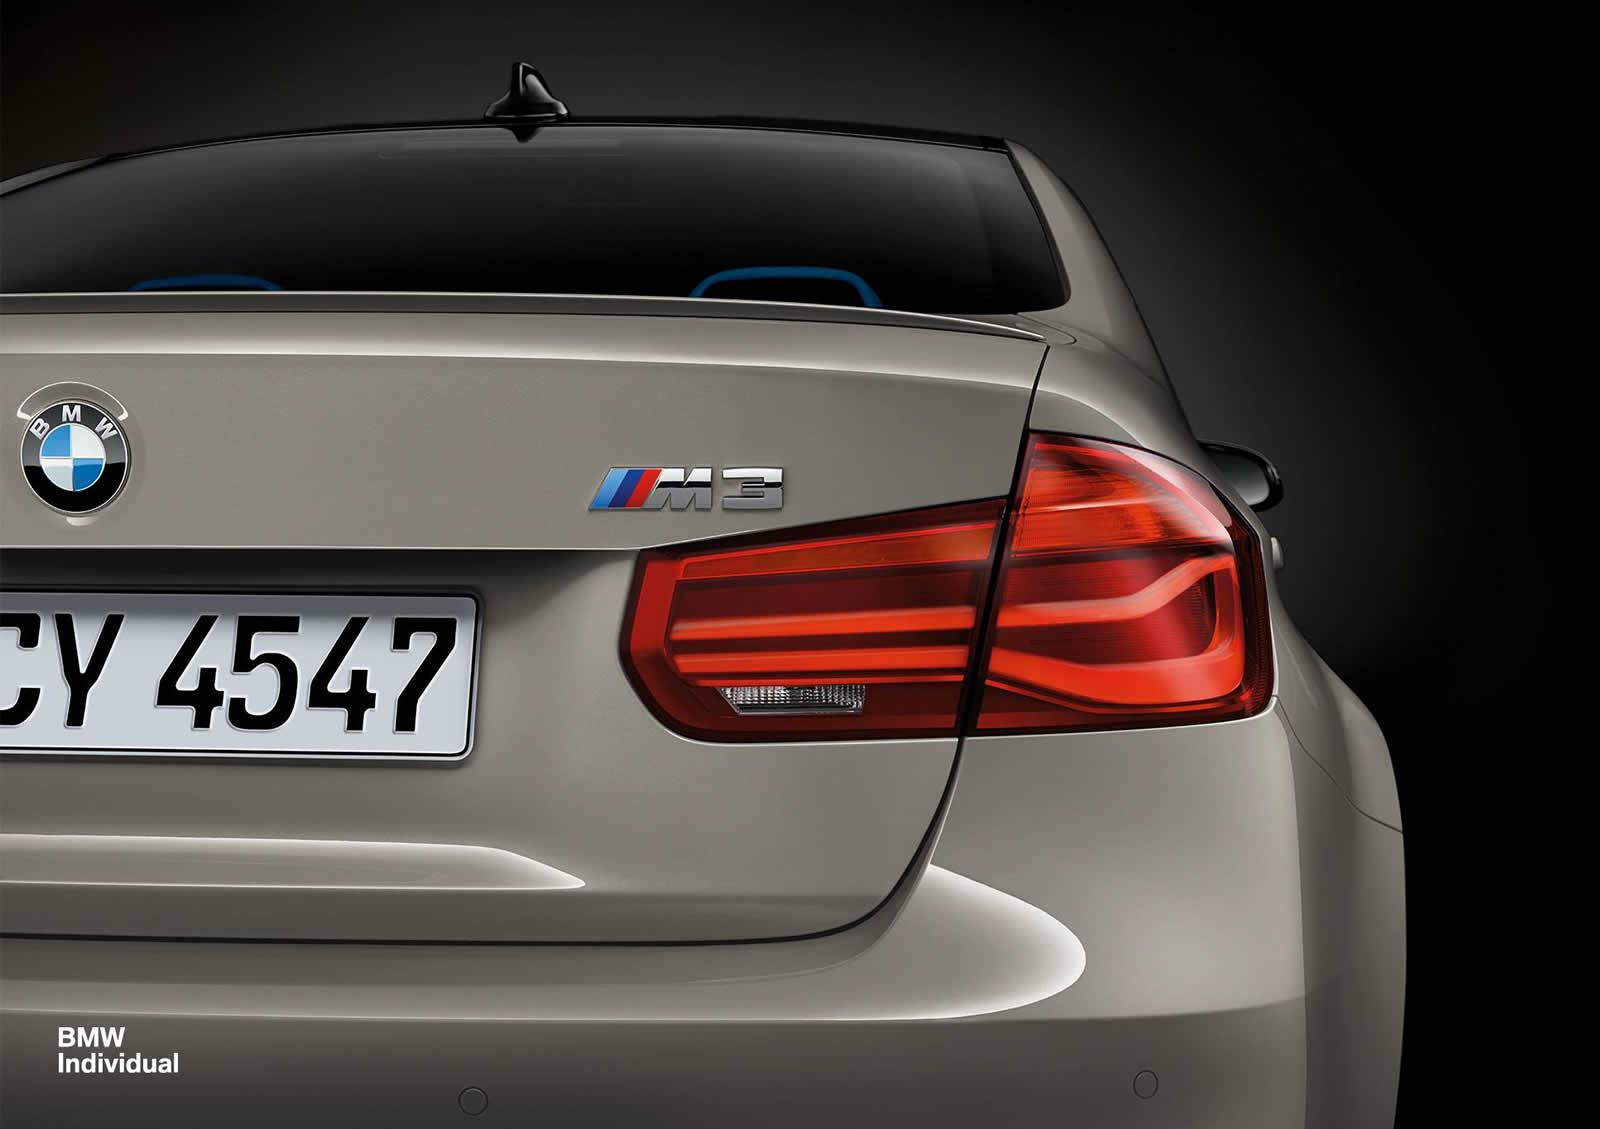 BMW F80 M3 Individual